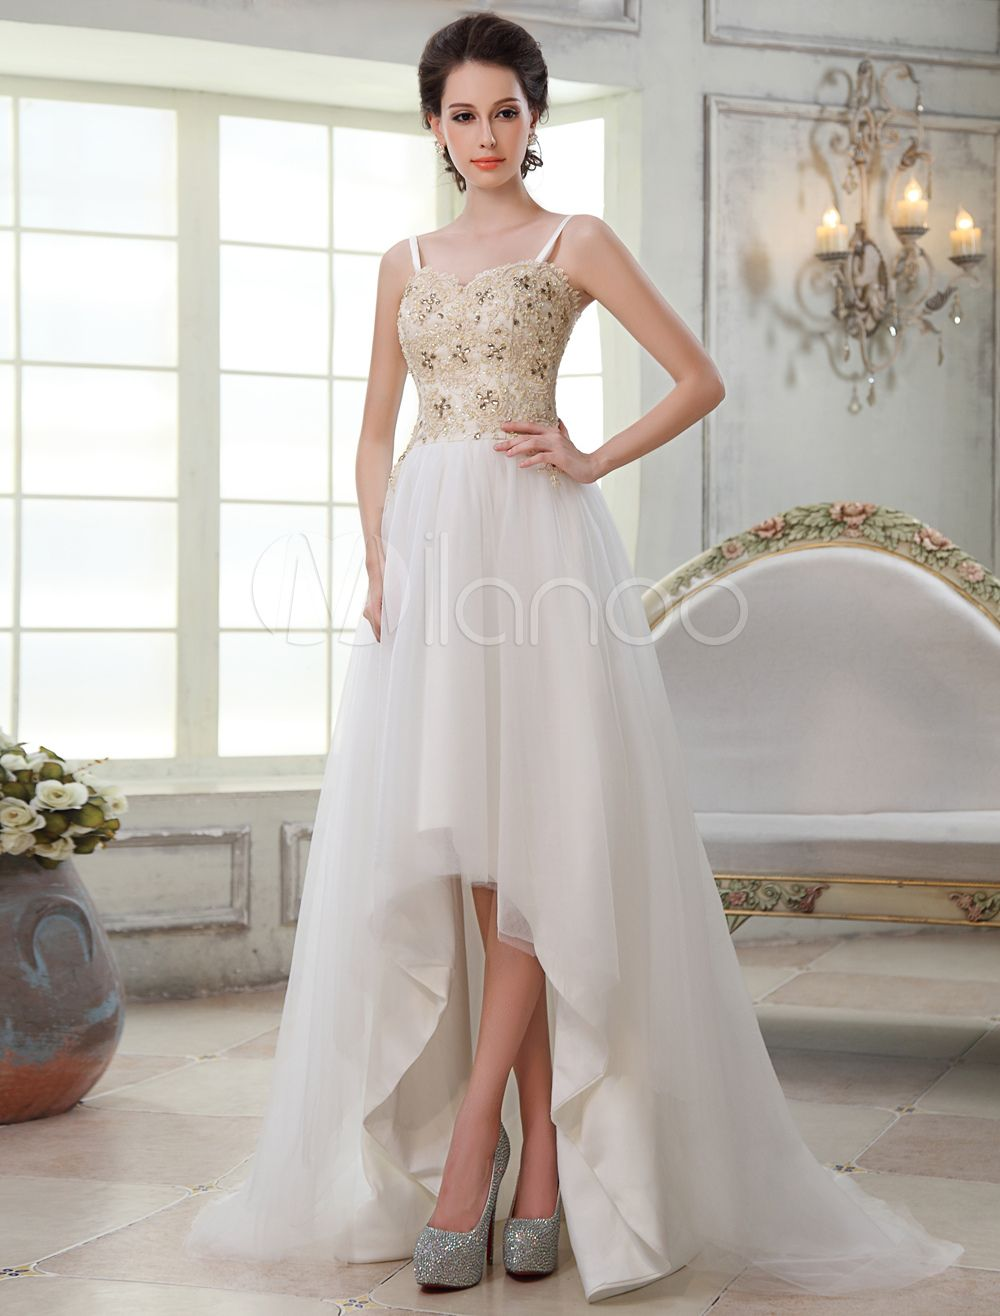 7d4c5bc7c8b A-line Sweetheart Spaghetti Strap Asymmetrical Bridal Wedding Dress with  Sequin Lace Milanoo - Milanoo.com